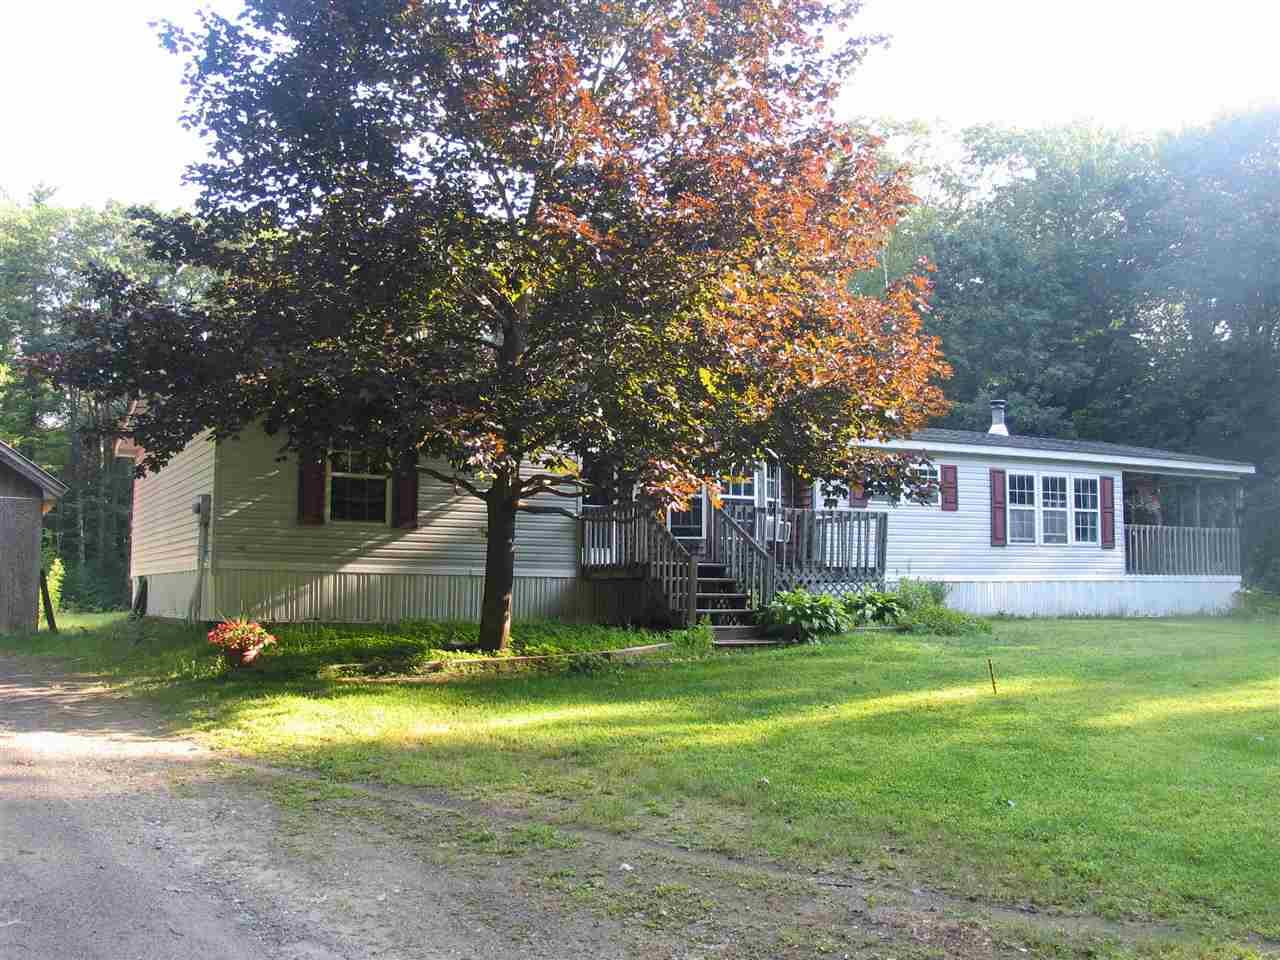 209 Sam Putnam Road, Charlestown, NH 03603